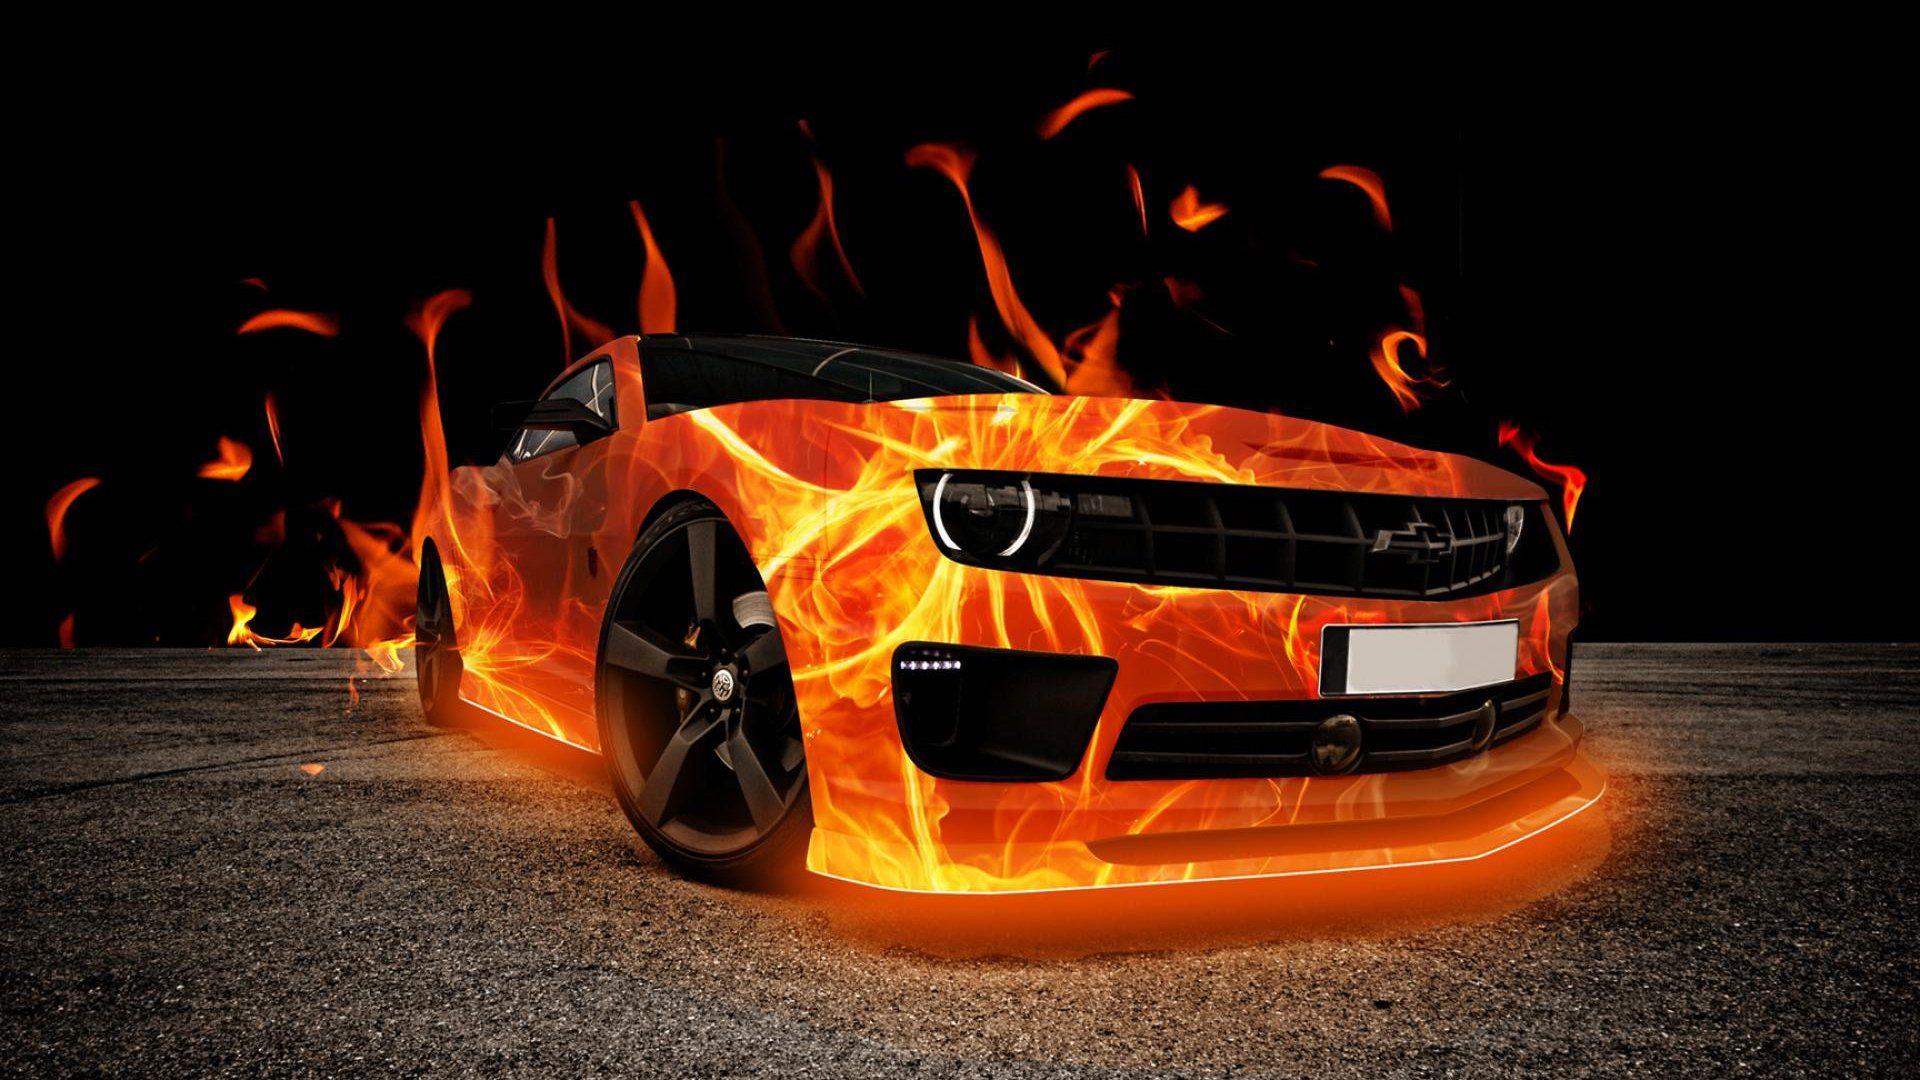 Sport Car Images Hd